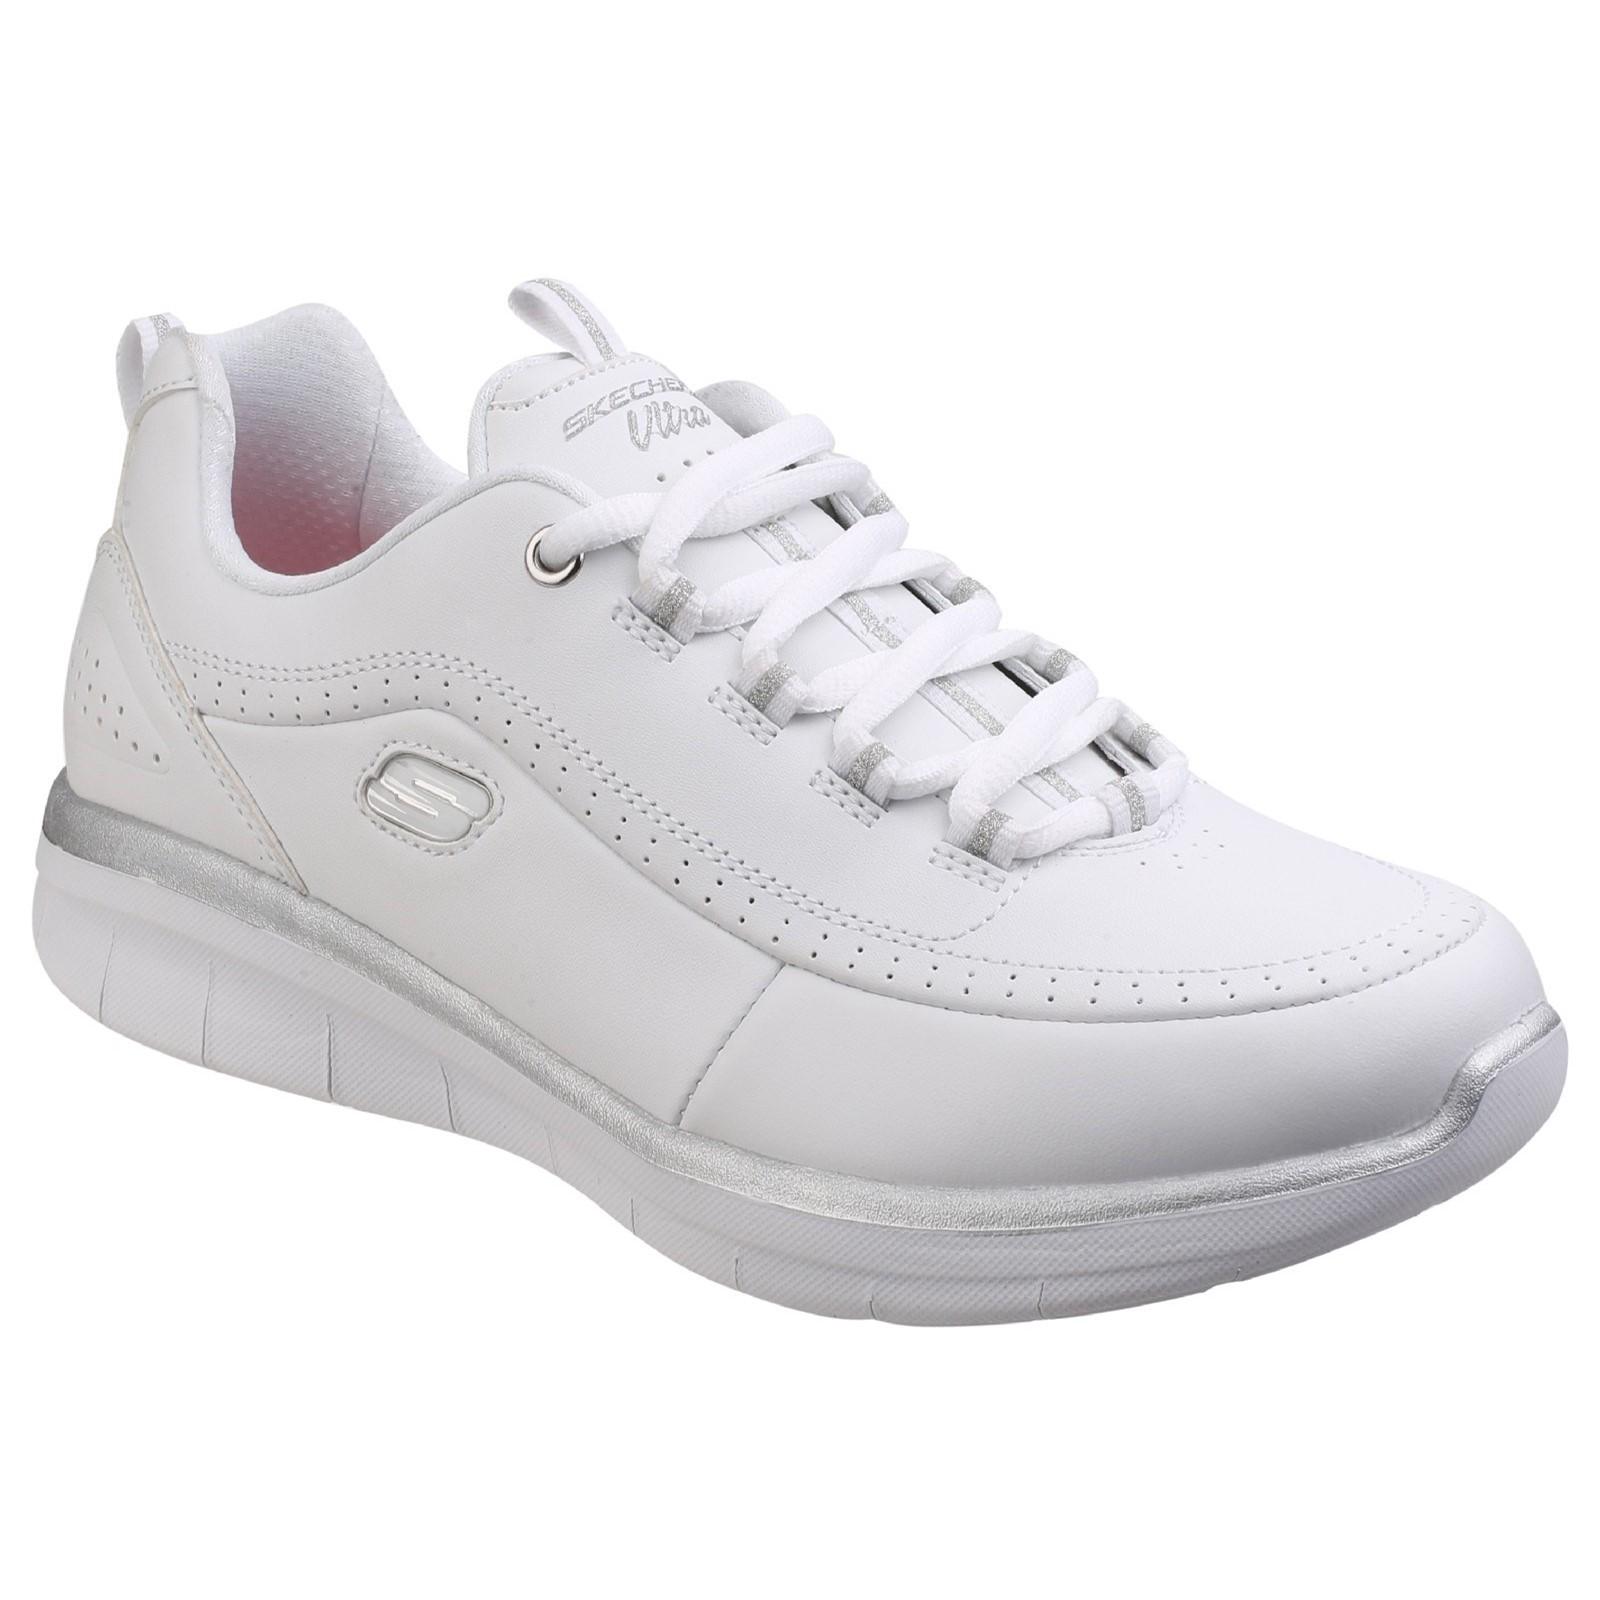 Calzature & Accessori bianchi per donna Skechers Synergy De Moda 7ThUtl